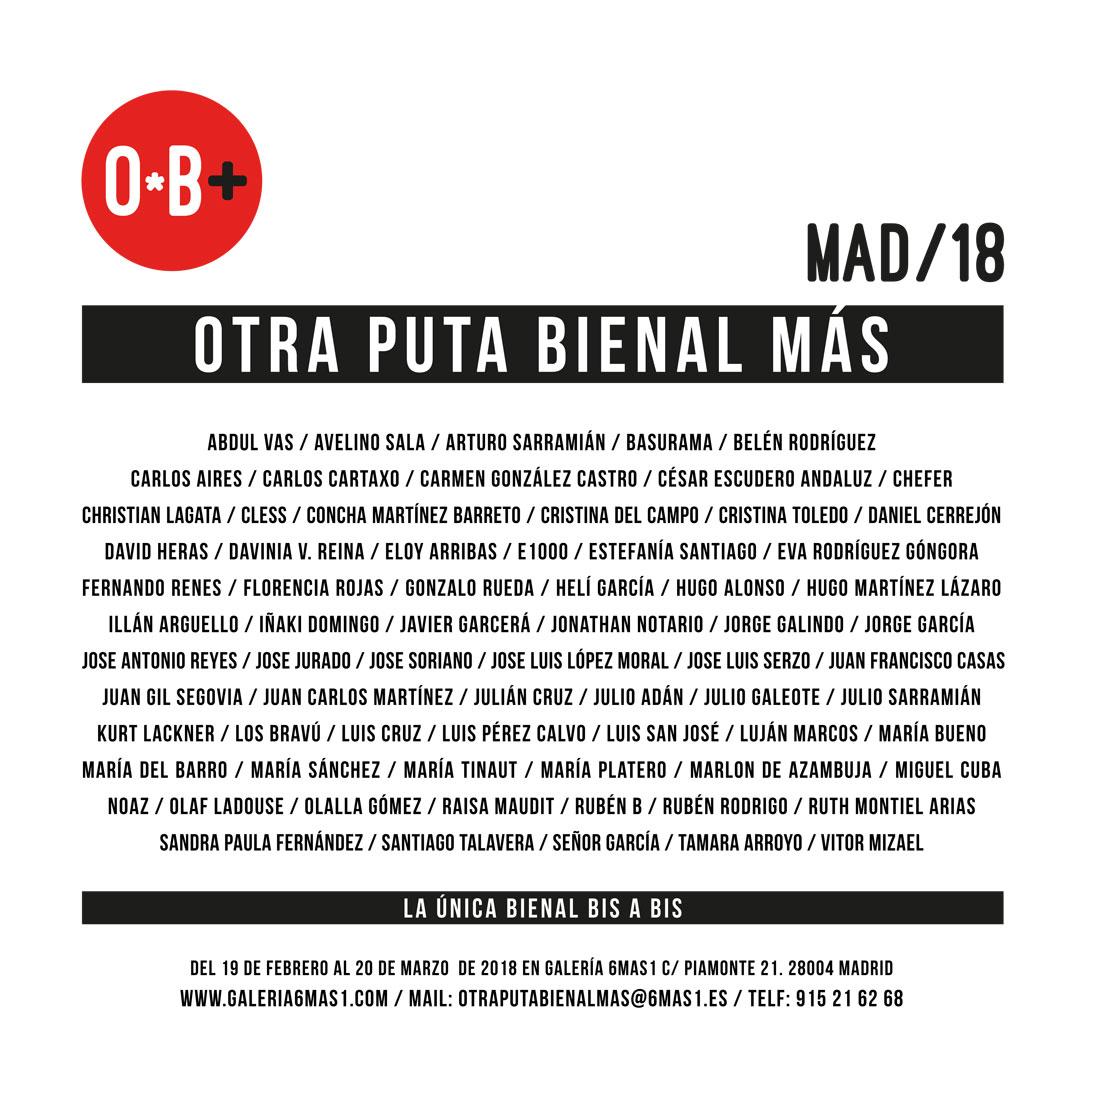 artistas-otra-puta-bienal-mas-julio-falagan